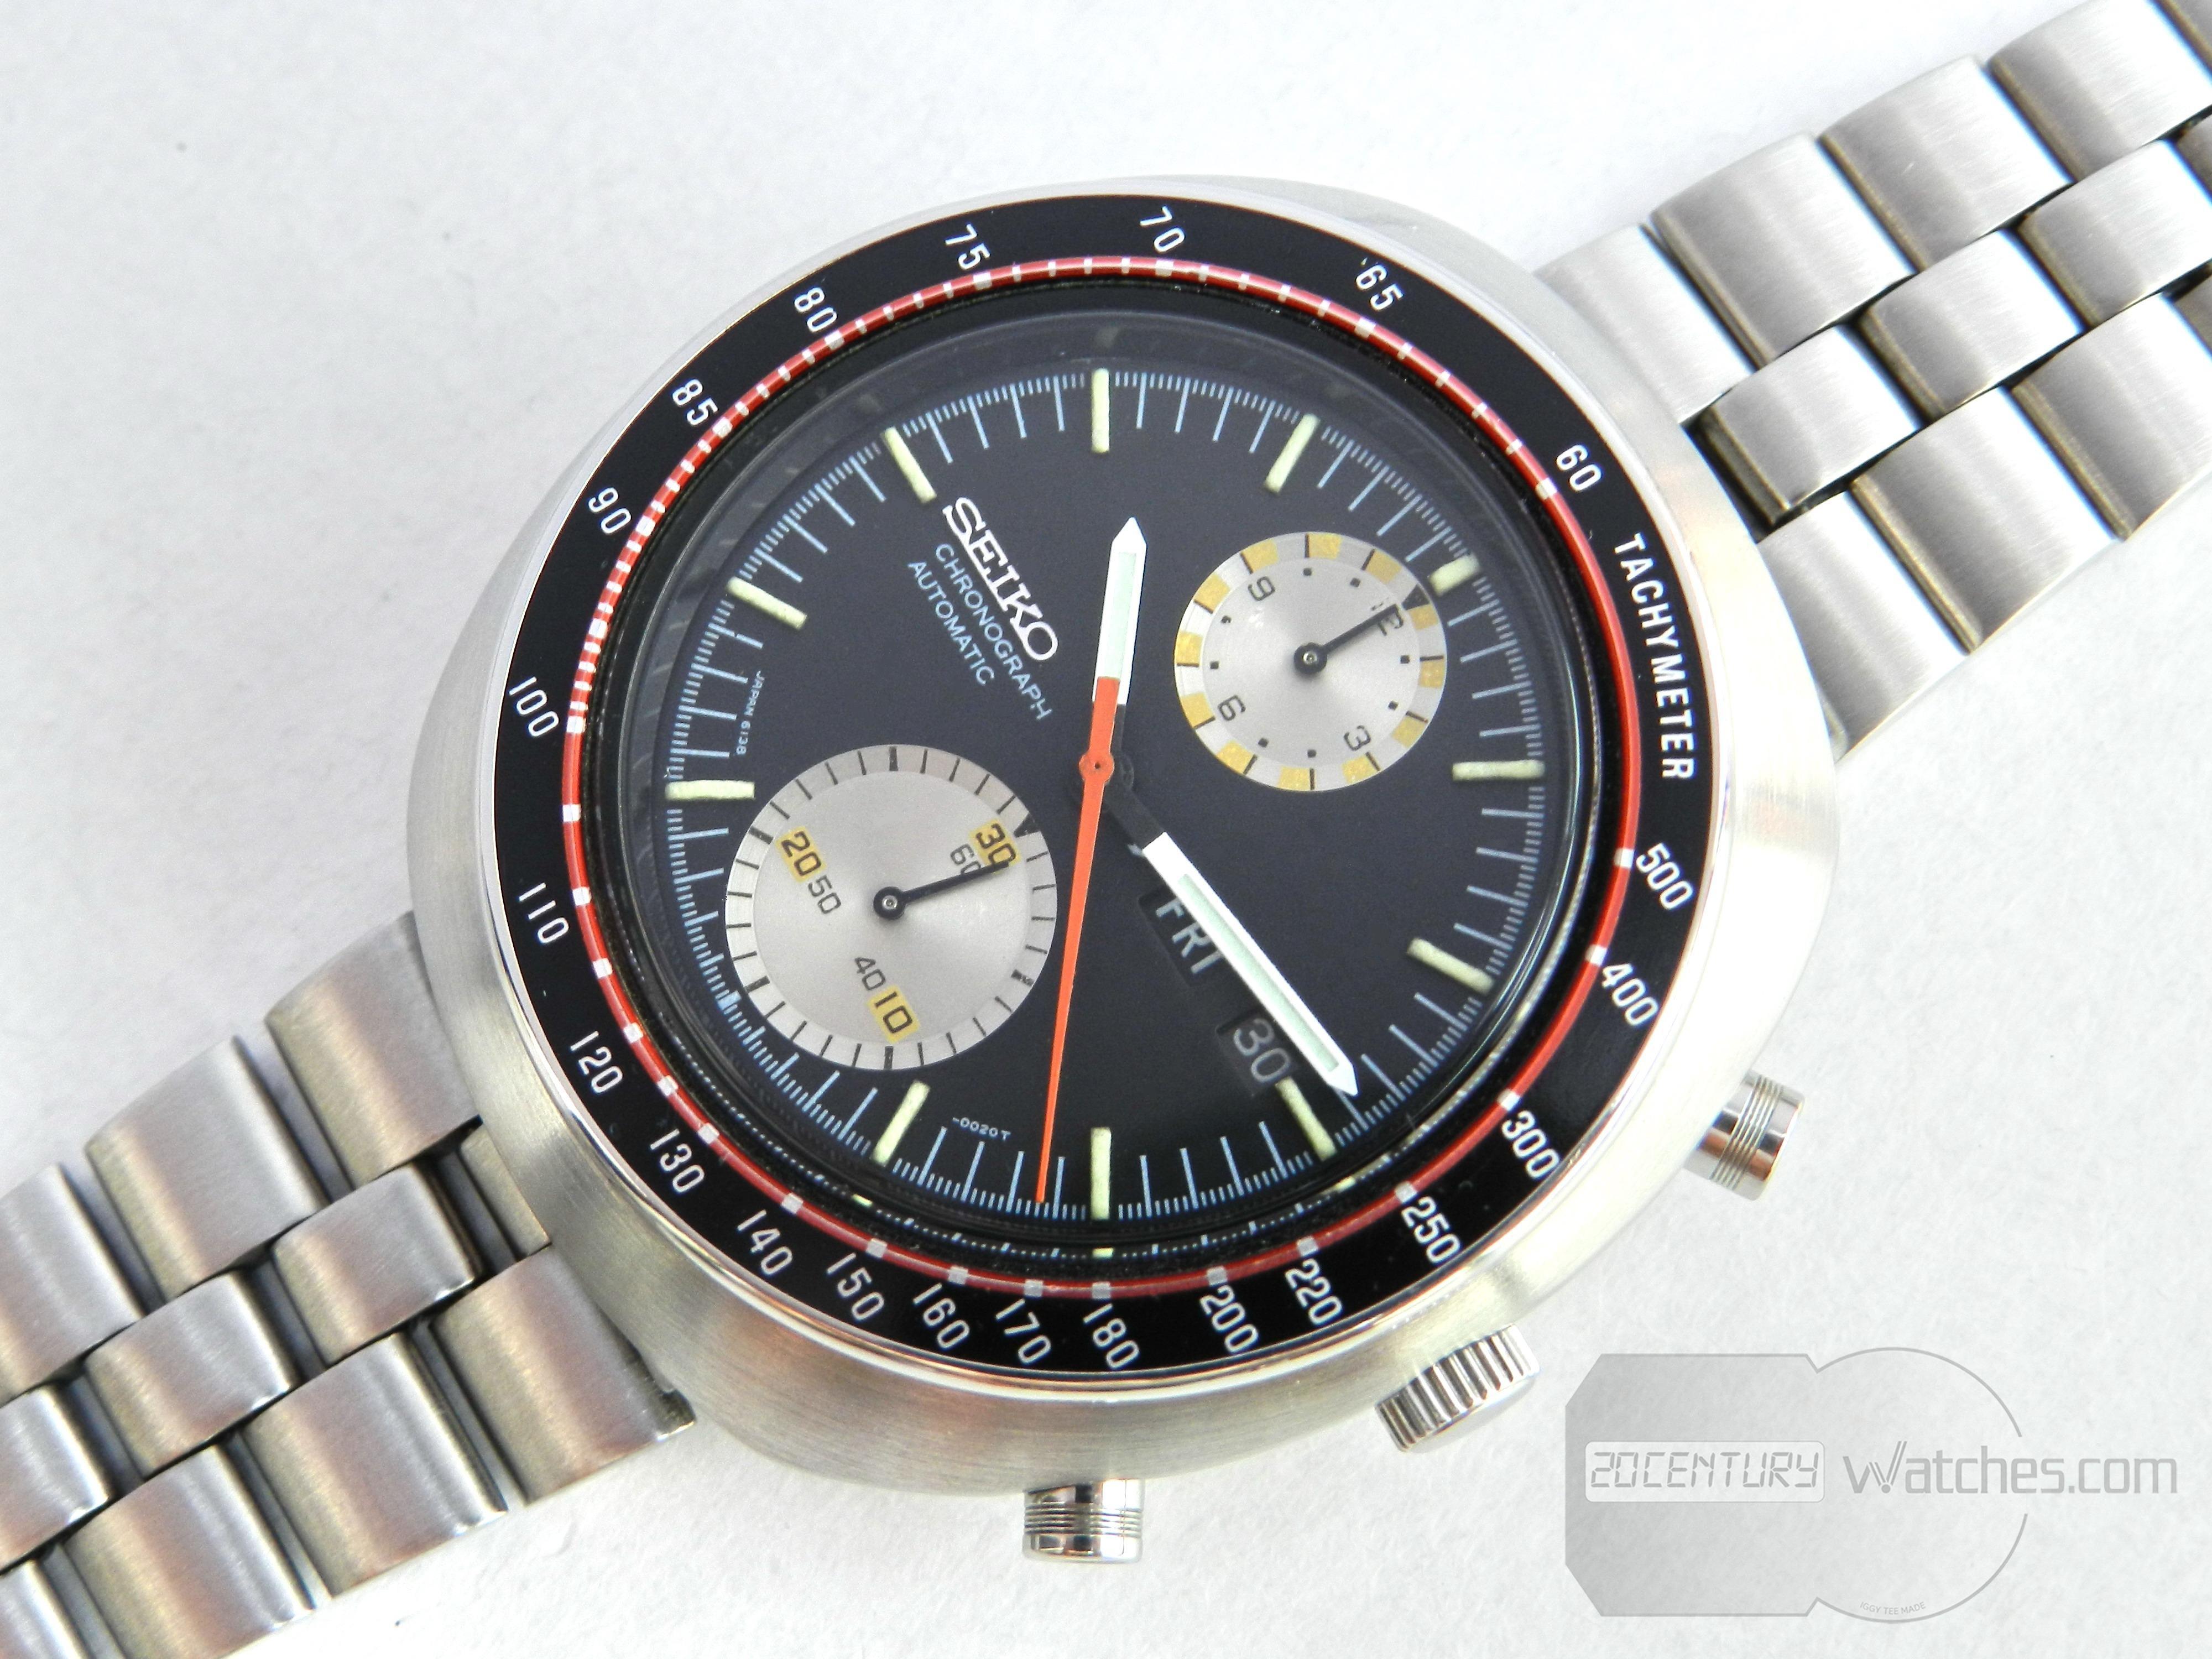 Seiko Chronograph Automatic (UFO)